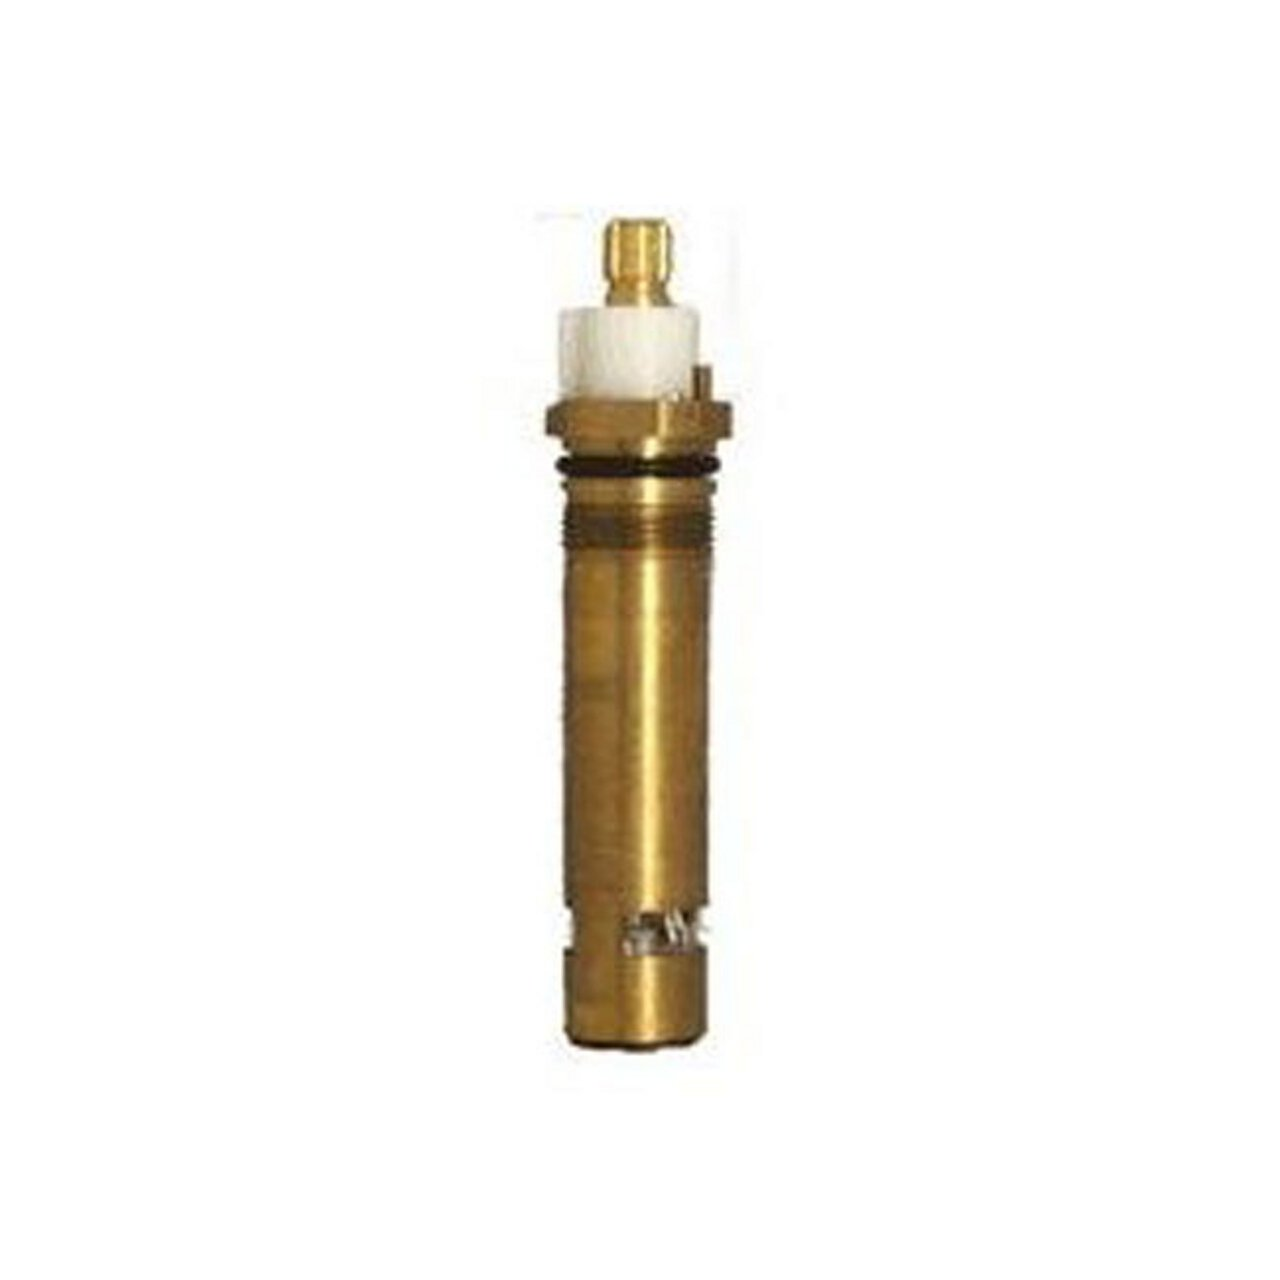 Pfister 910-3050 S/P Ceramic Cartridge 9103050